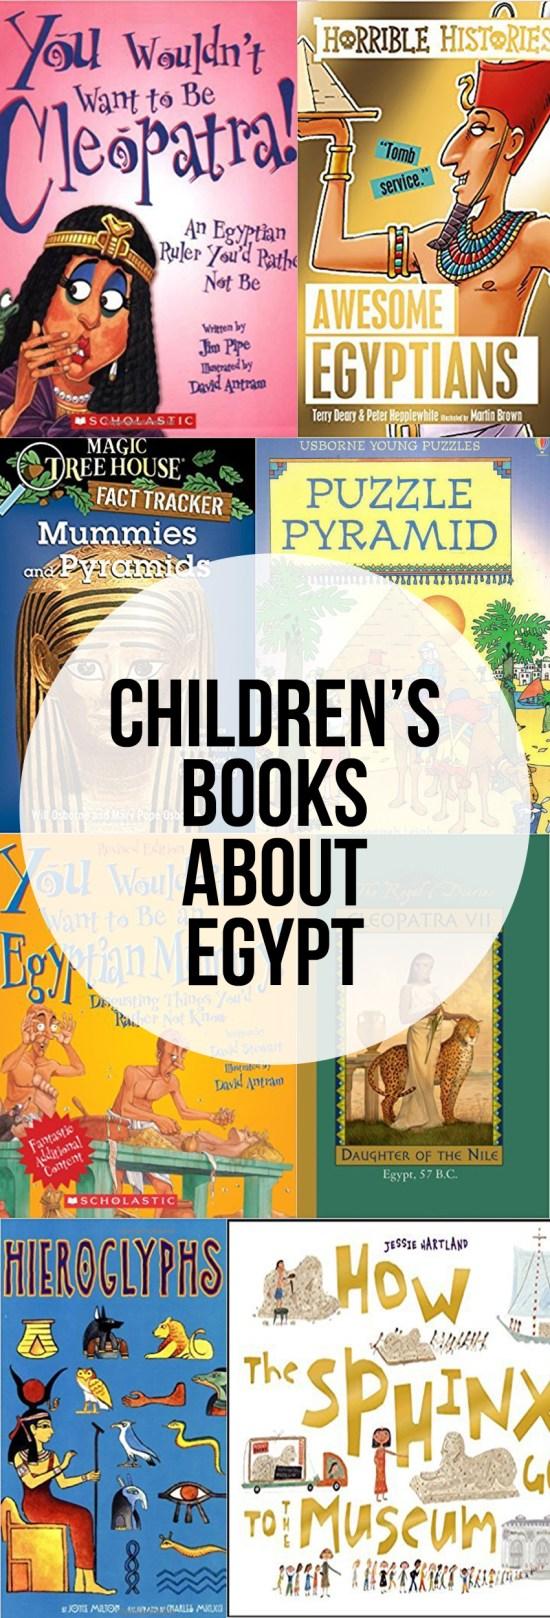 Children's Books About Egypt